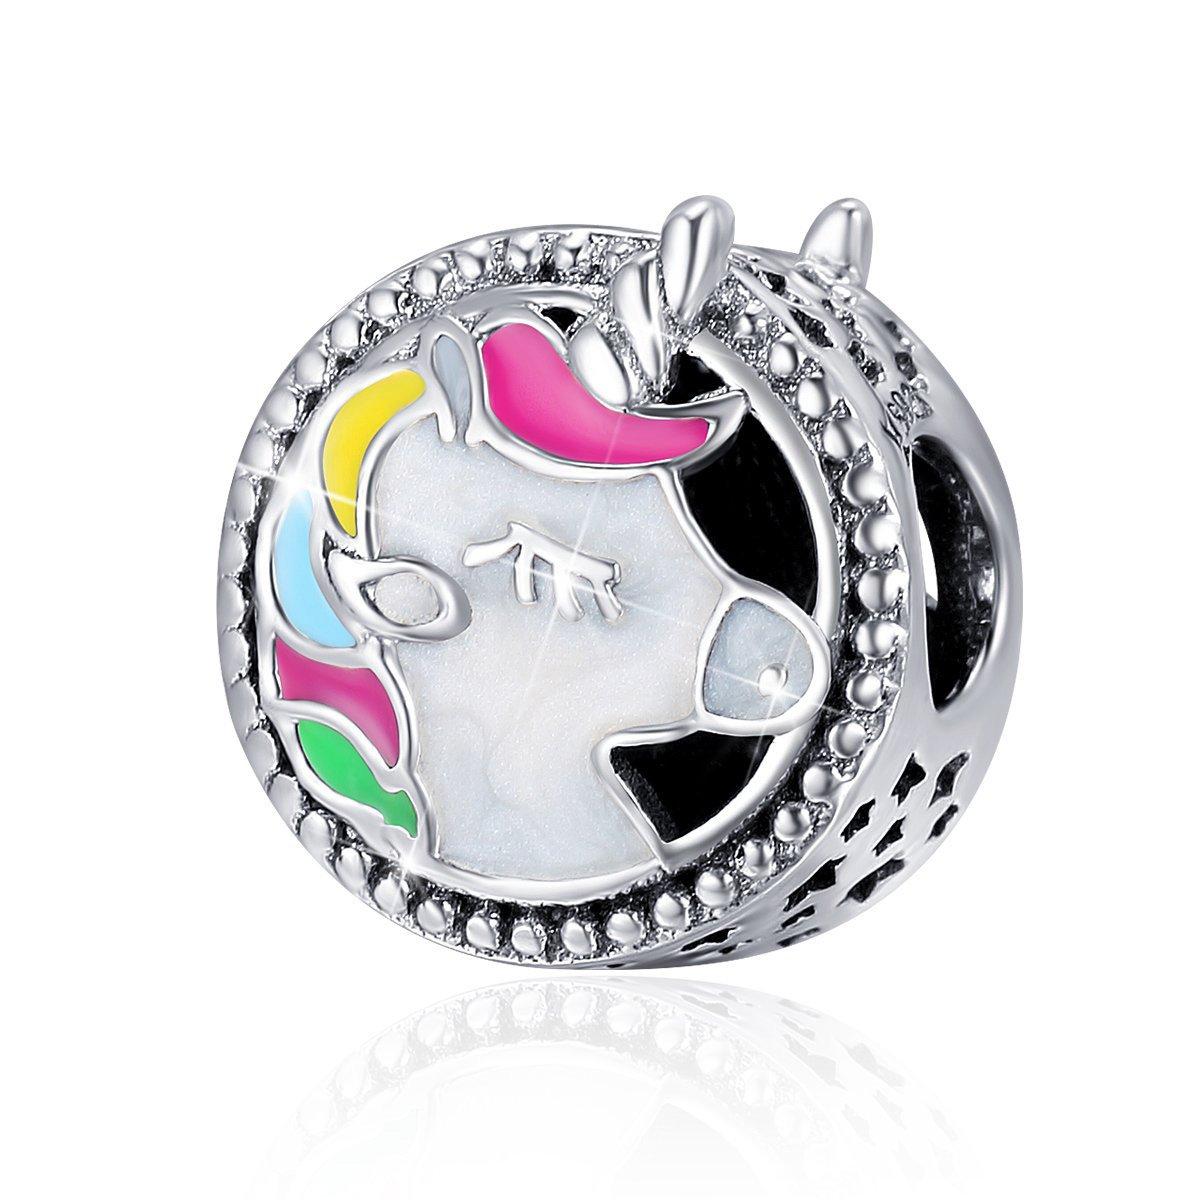 Forever Queen Unicorn Charm for Pandora Charm Bracelet, Round Shape Genuine 925 Sterling Silver Colorful Enamel Bead for Pandora European Bracelets BJ09002 by Forever Queen (Image #1)